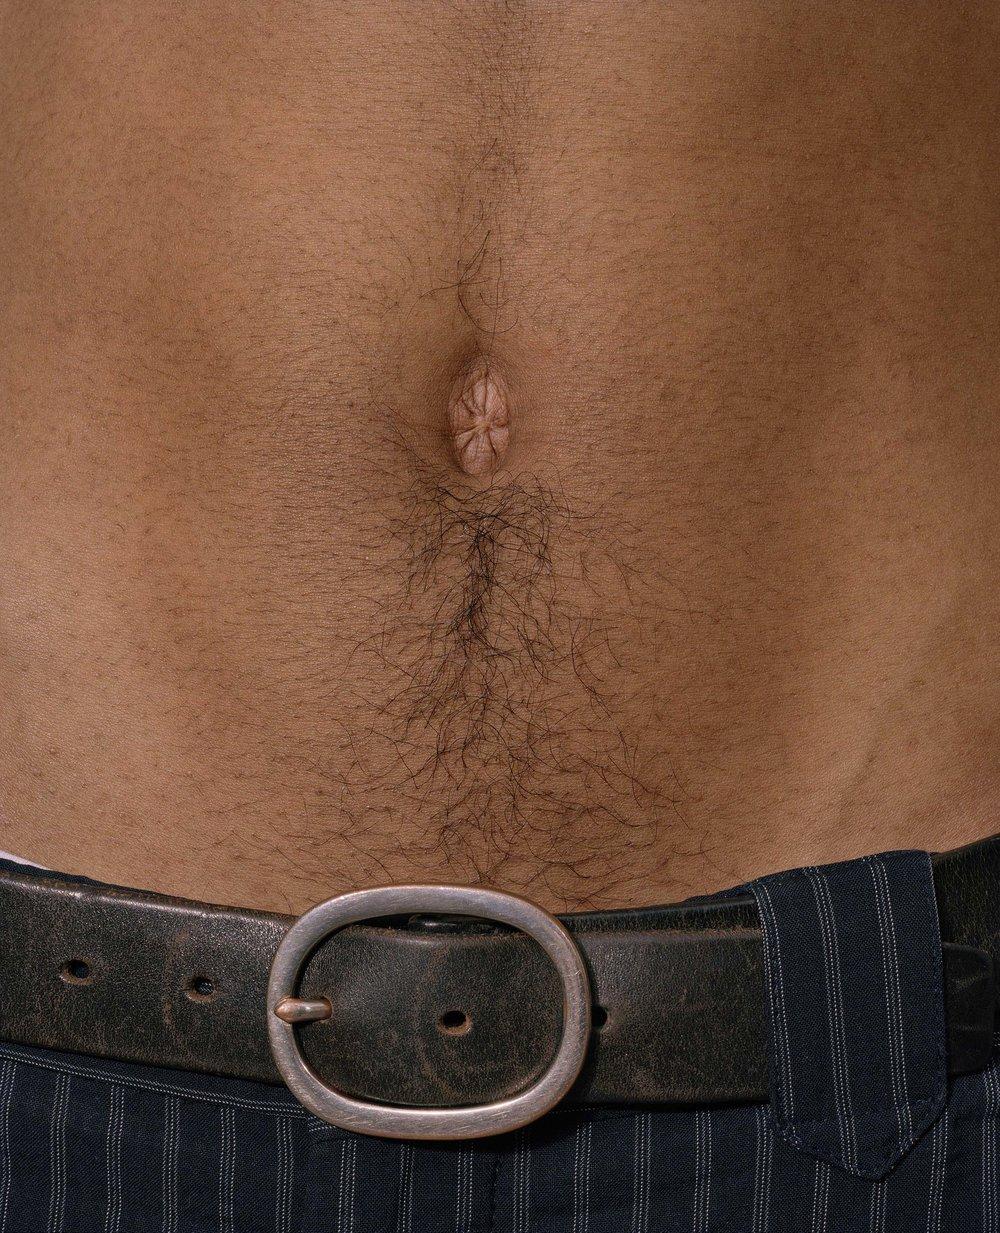 evan's navel